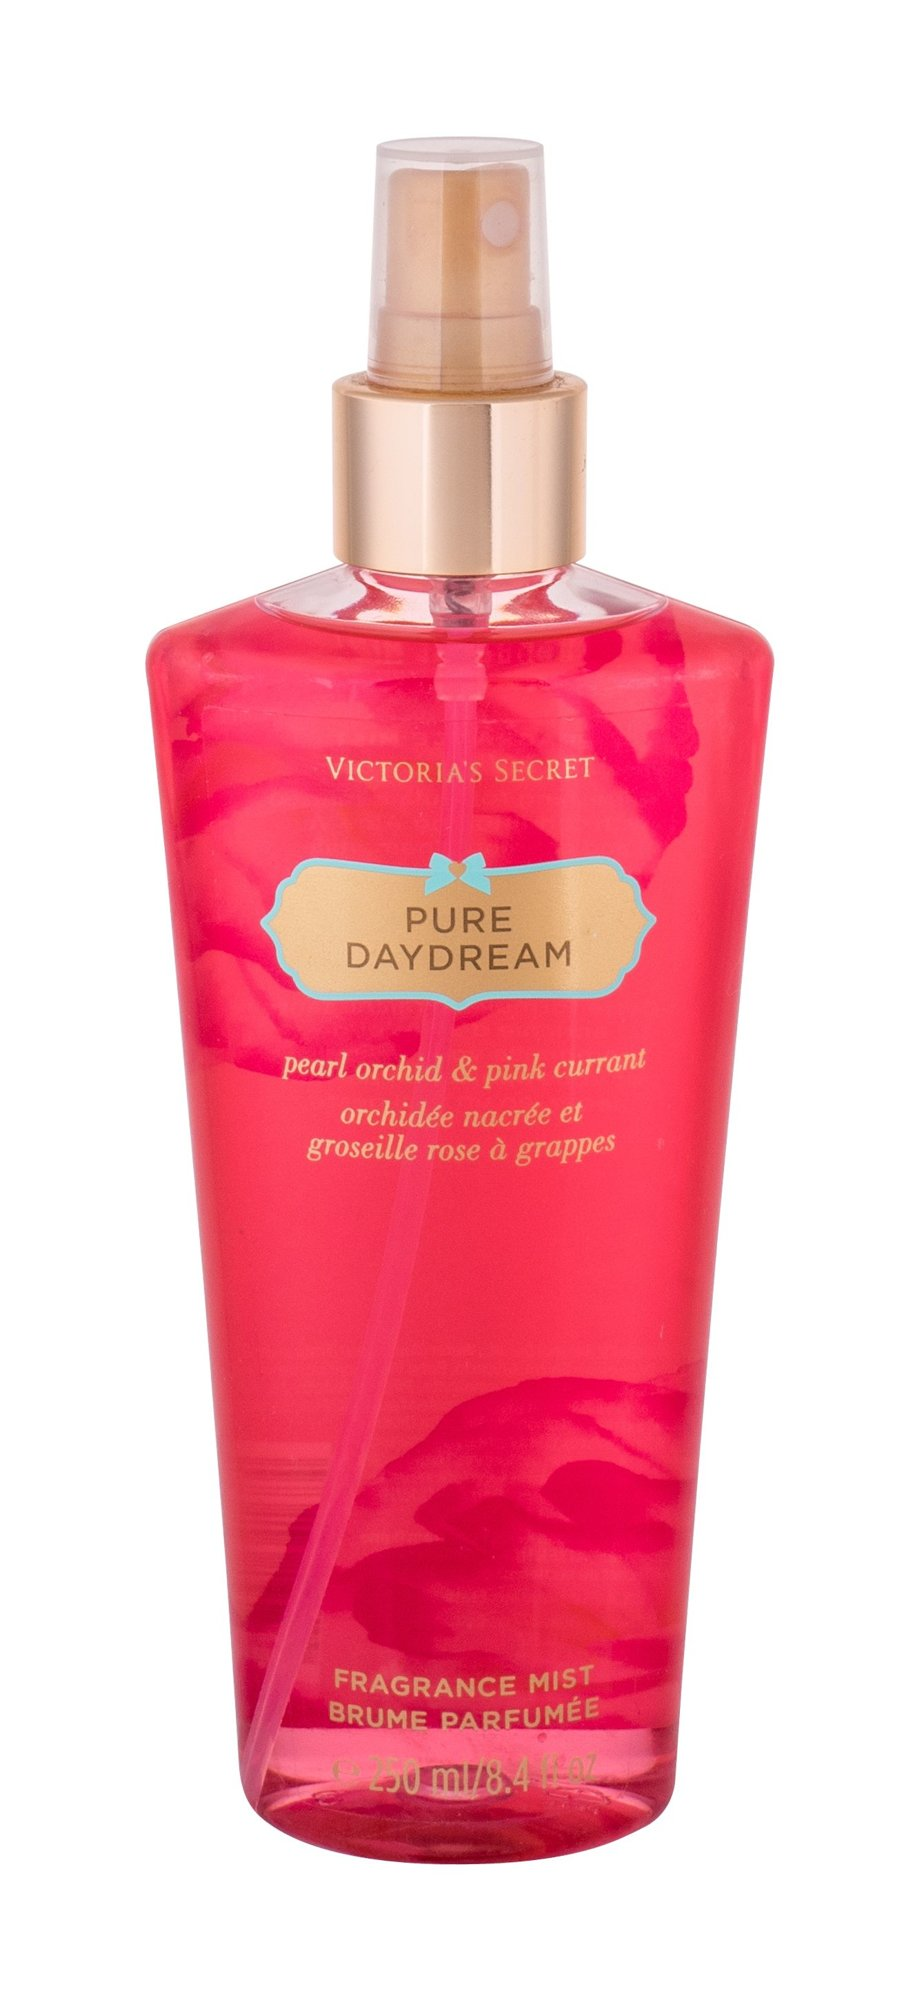 Victoria´s Secret Pure Daydream Nourishing body spray 250ml